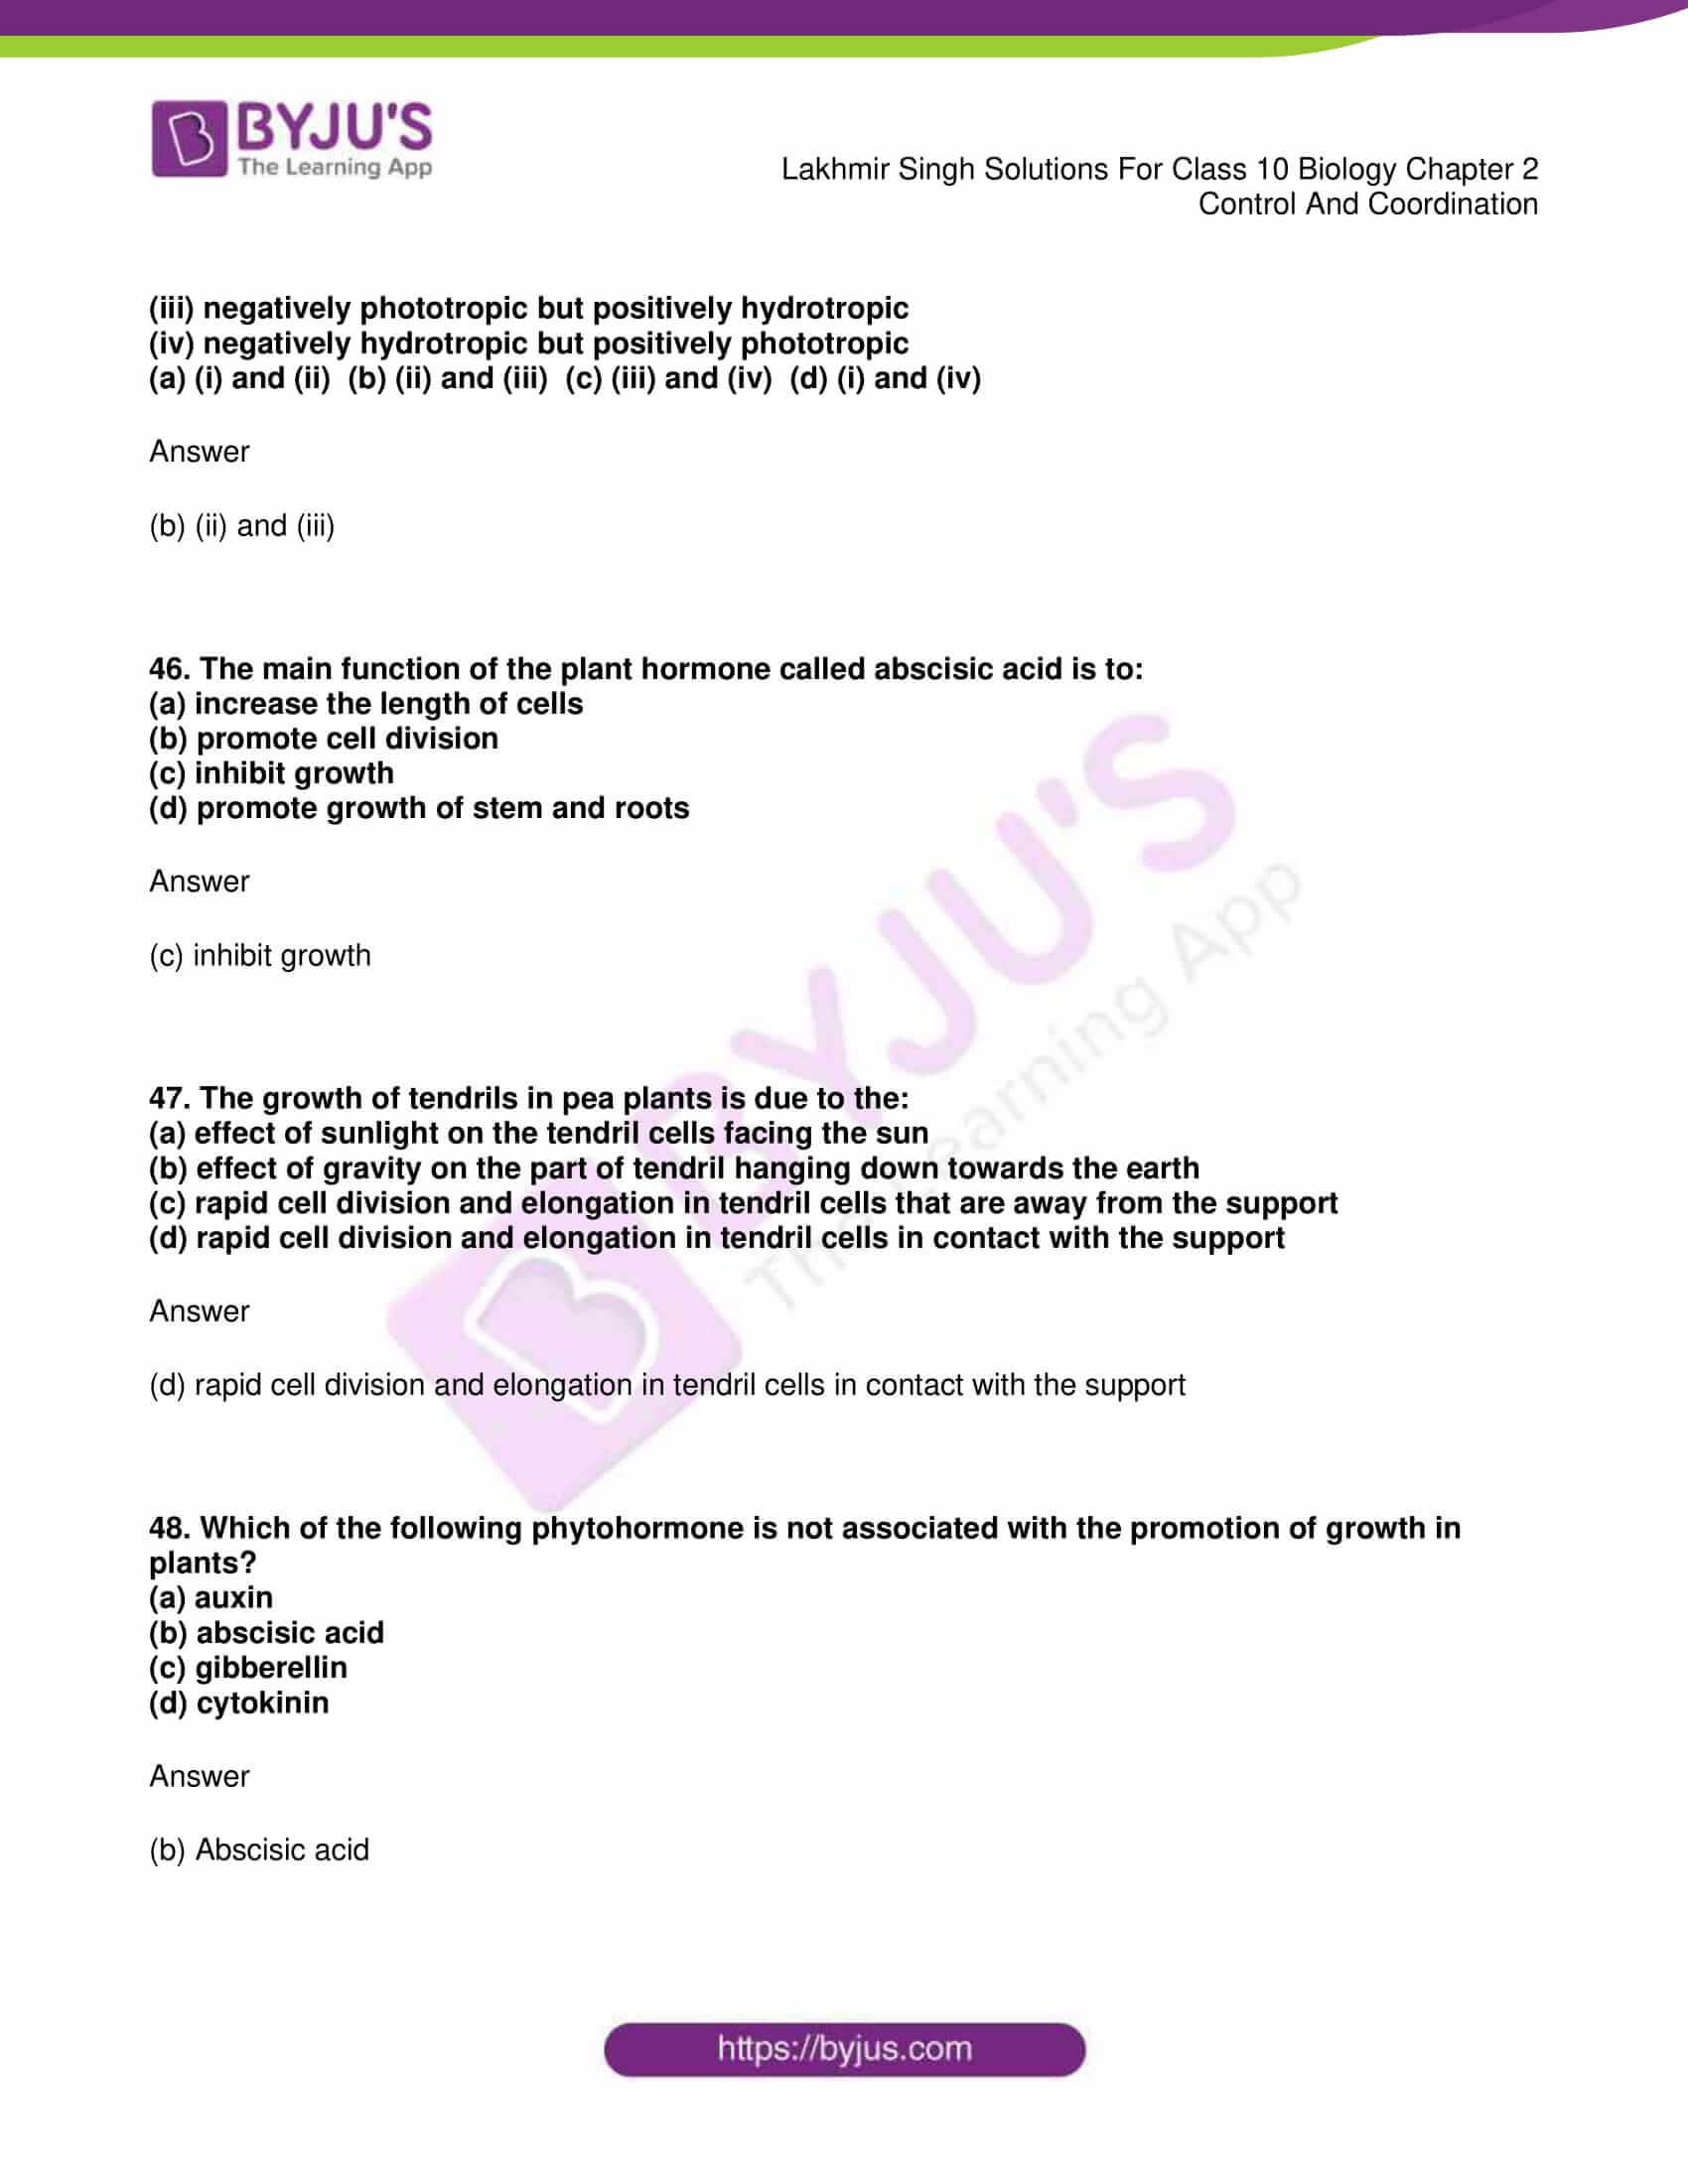 lakhmir singh sol class 10 biology chapter 2 16